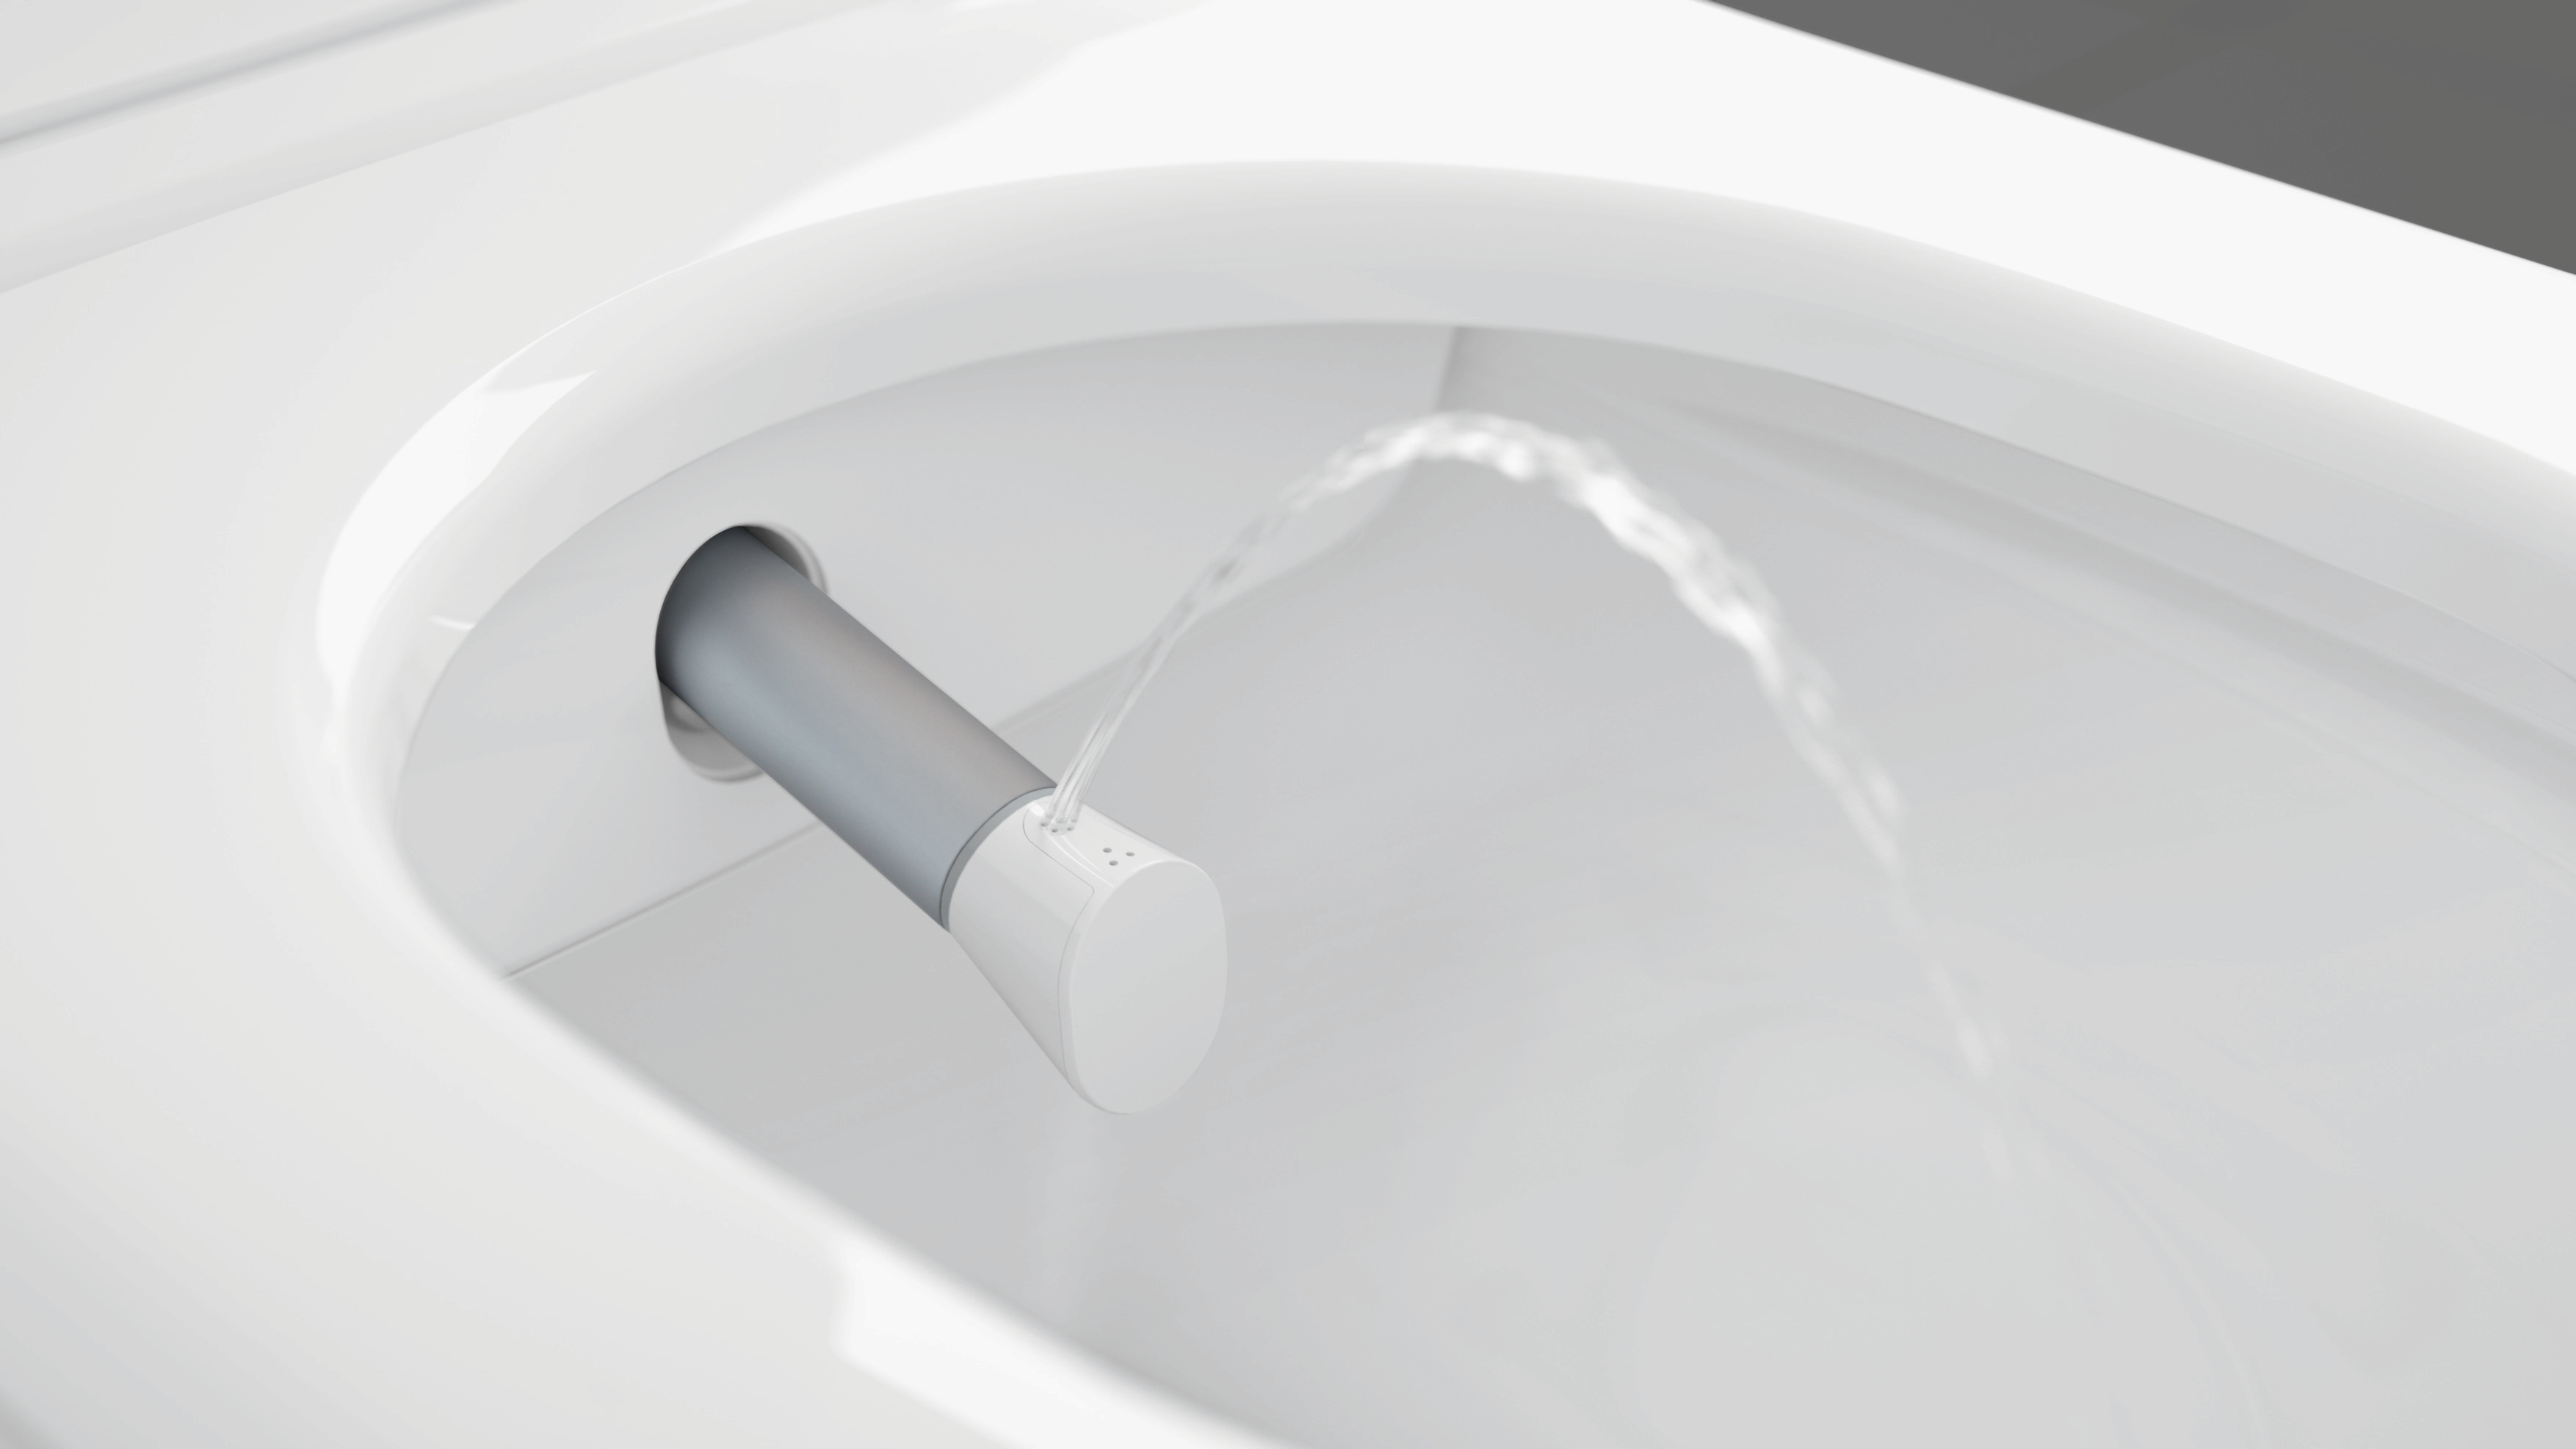 Douche-wc ViClean 100 van Villeroy & Boch #toilet